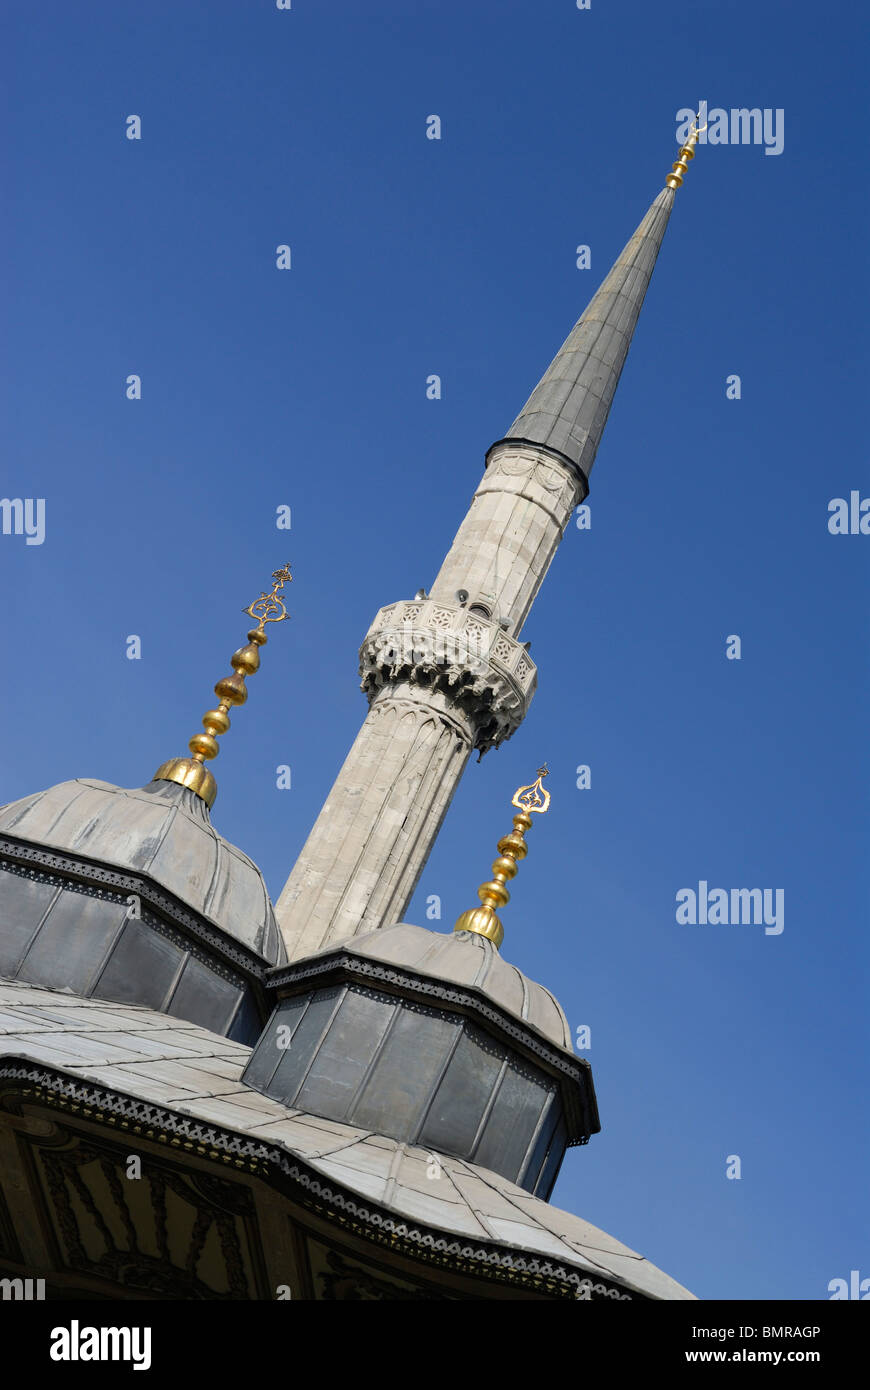 Istanbul. Turkey. Detail of fountain of Ahmet III & minaret of Aya Sofya. - Stock Image